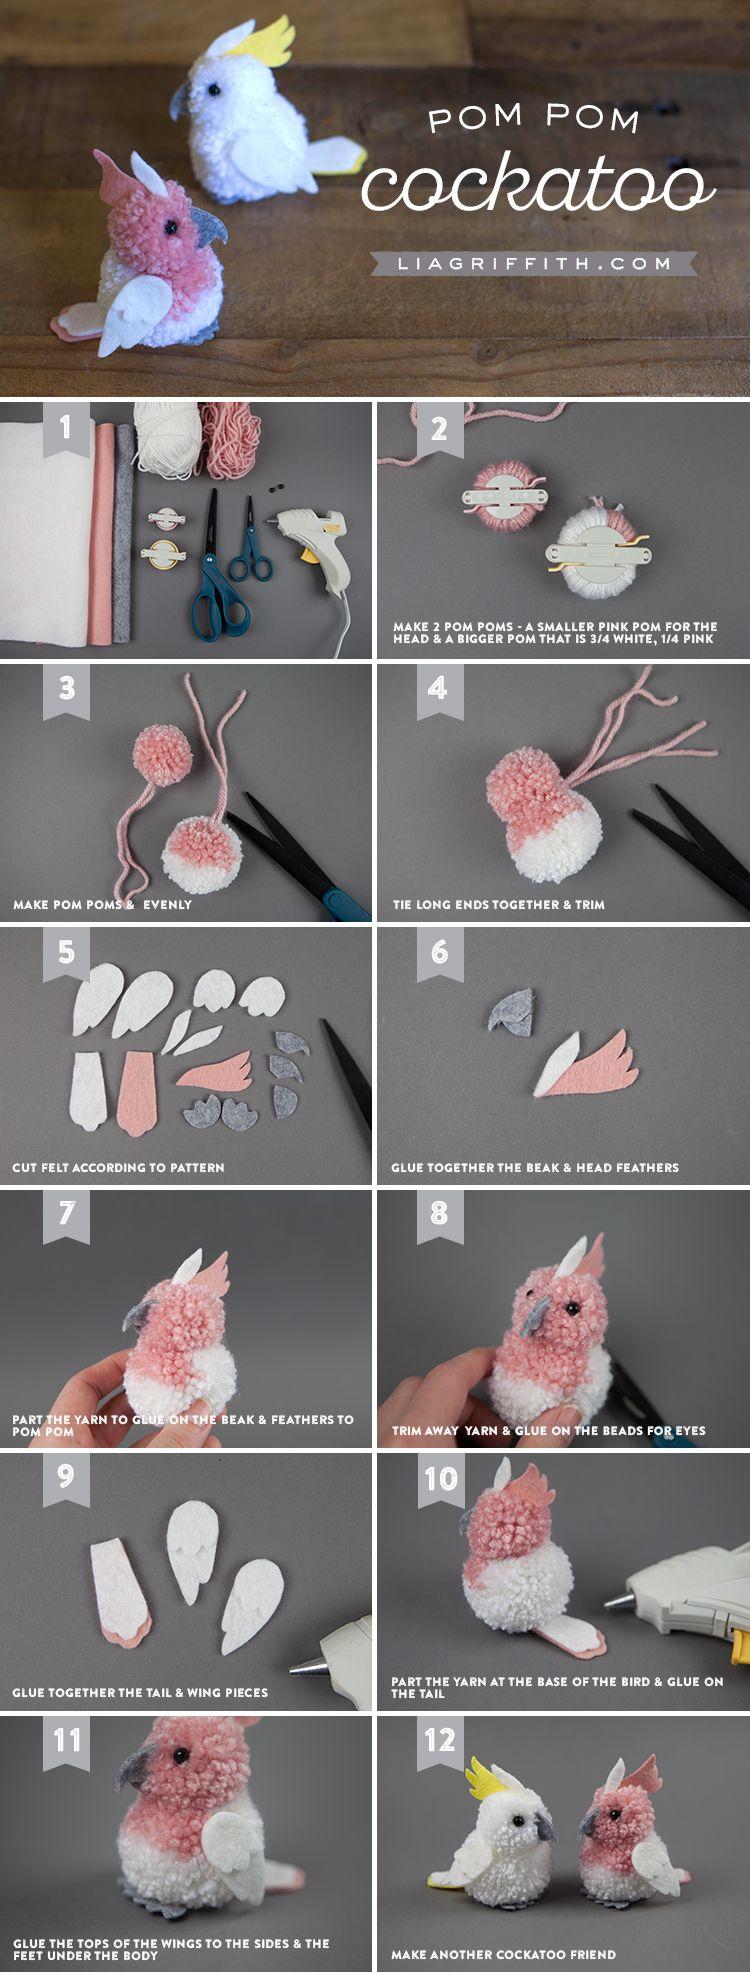 Craft These Really Cute Pom-Pom & Felt Cockatoos! #cutecreatures